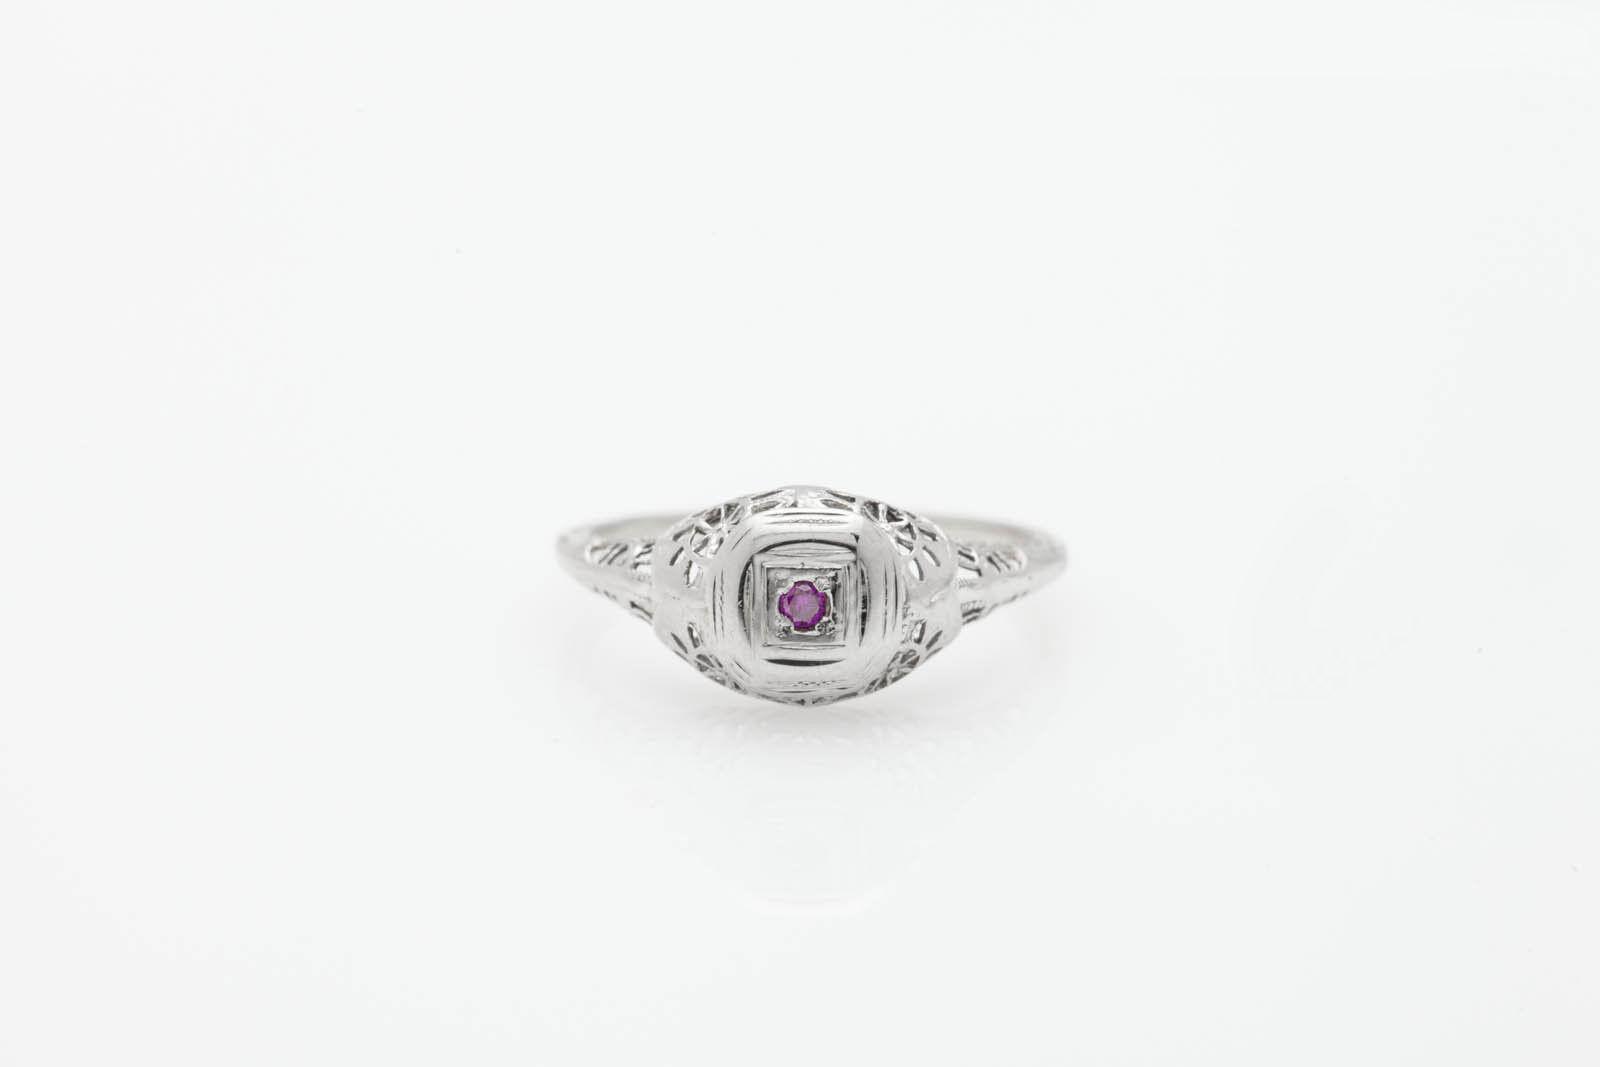 Antique 1920s Genuine Natural VIVID Purple Diamond 18k White gold Filigree Ring